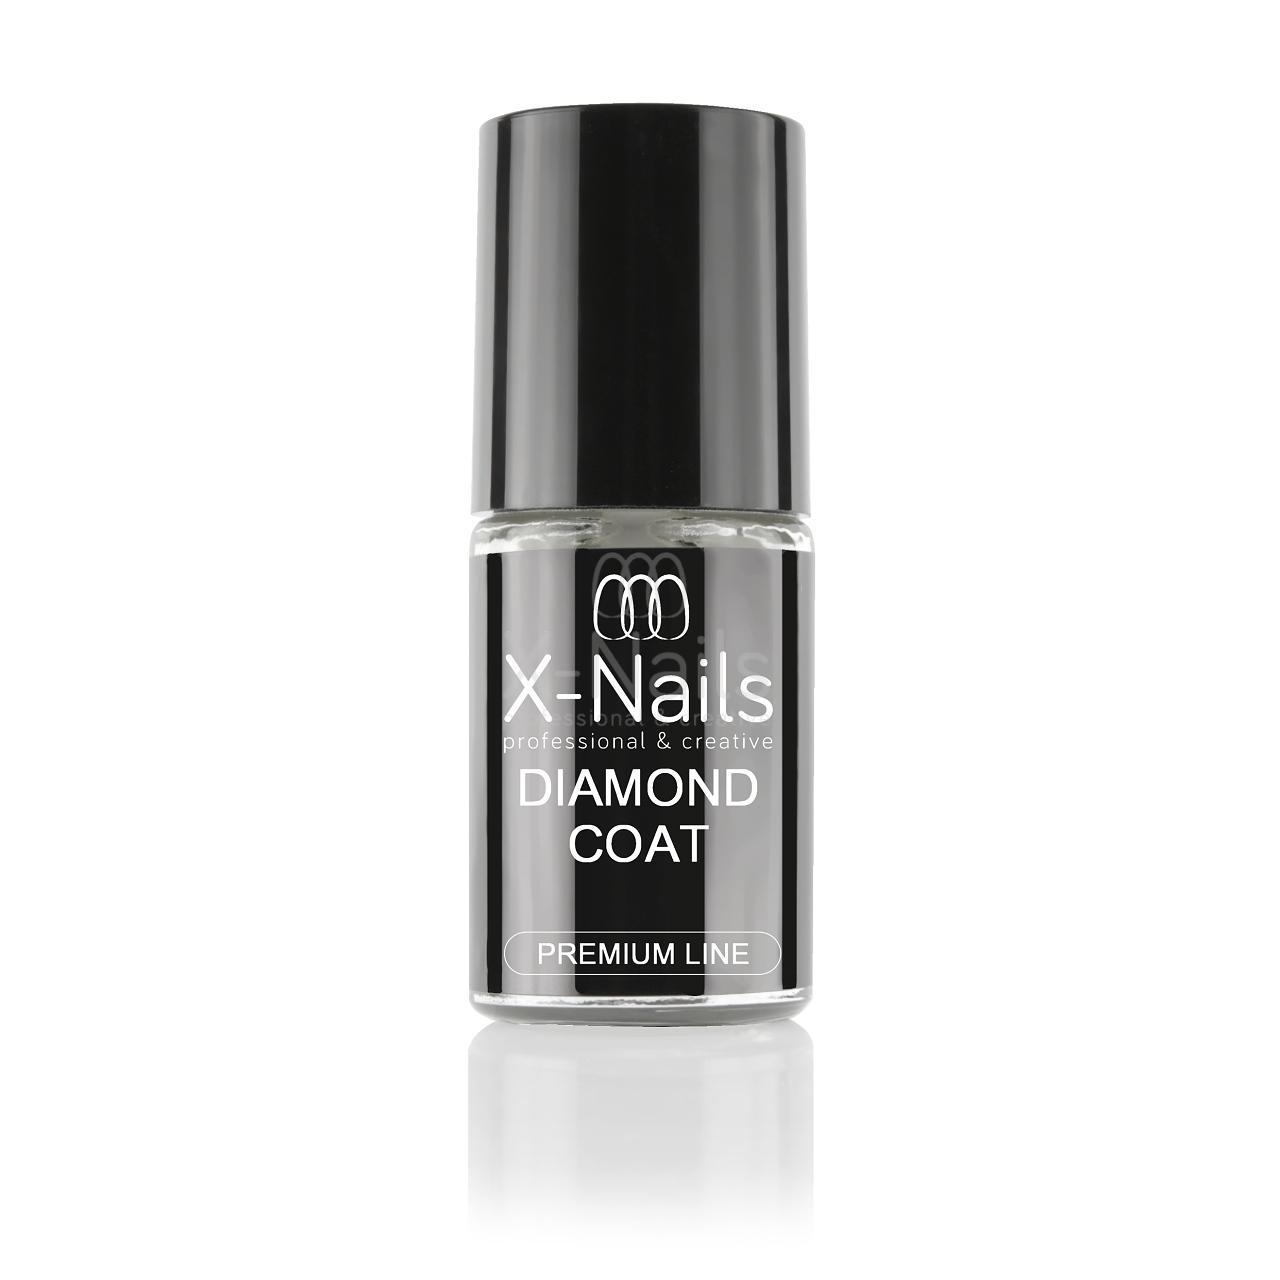 X Nails Zakoncovaci Lak Pro Extra Odolnost 5 Ml Diamond Coat